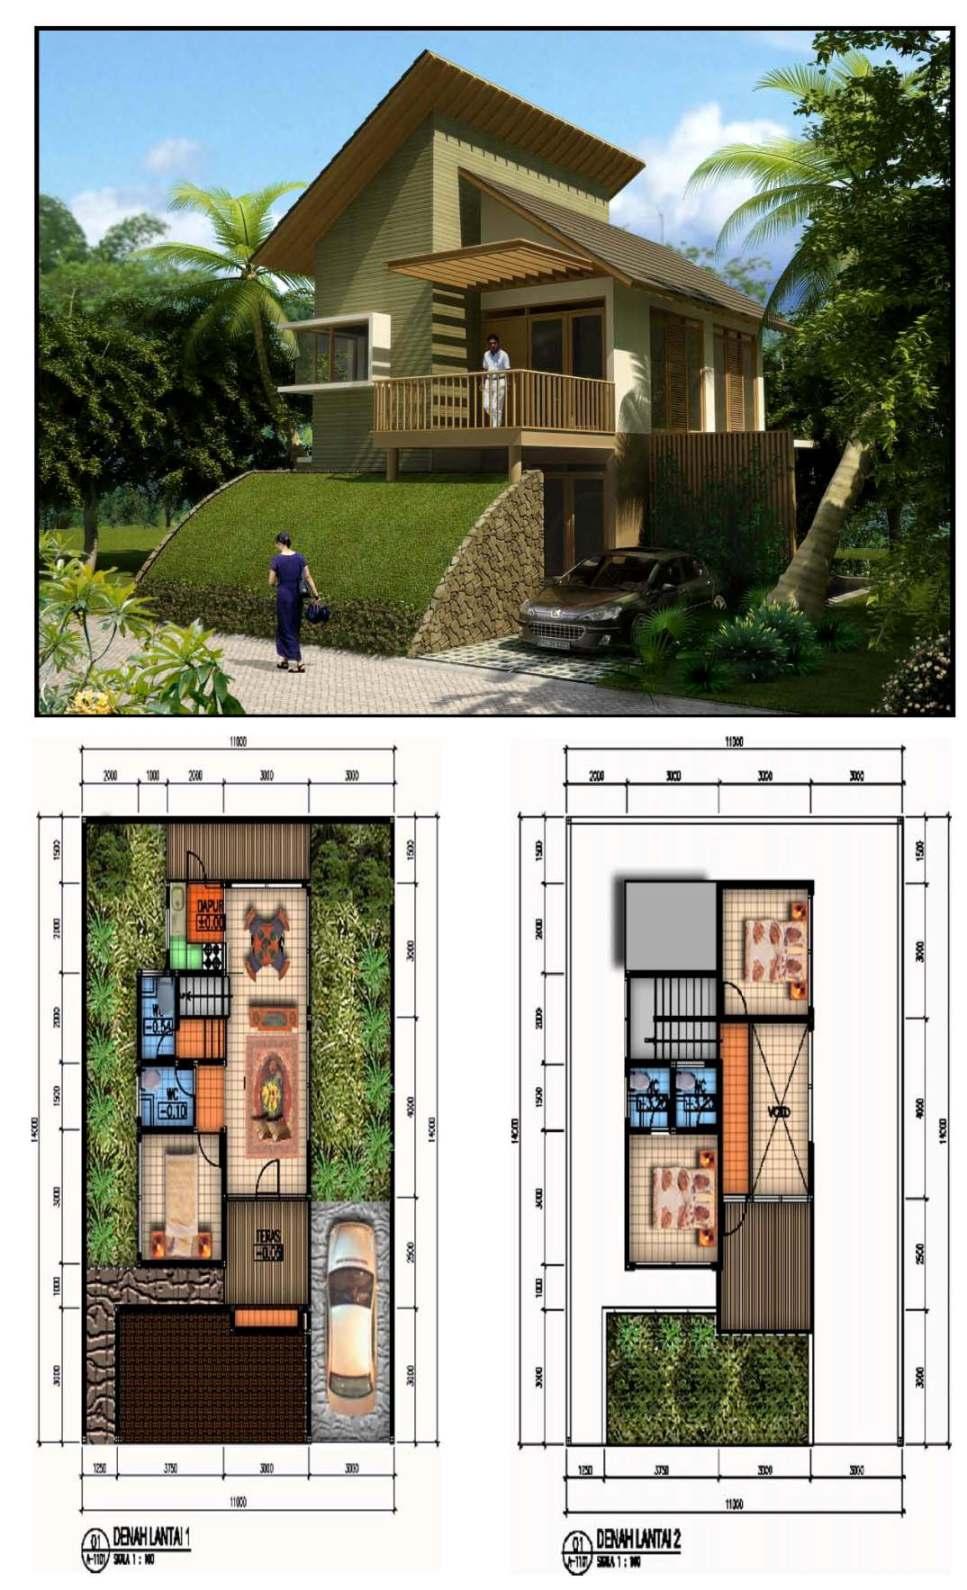 interior rumah interior rumah interior rumah